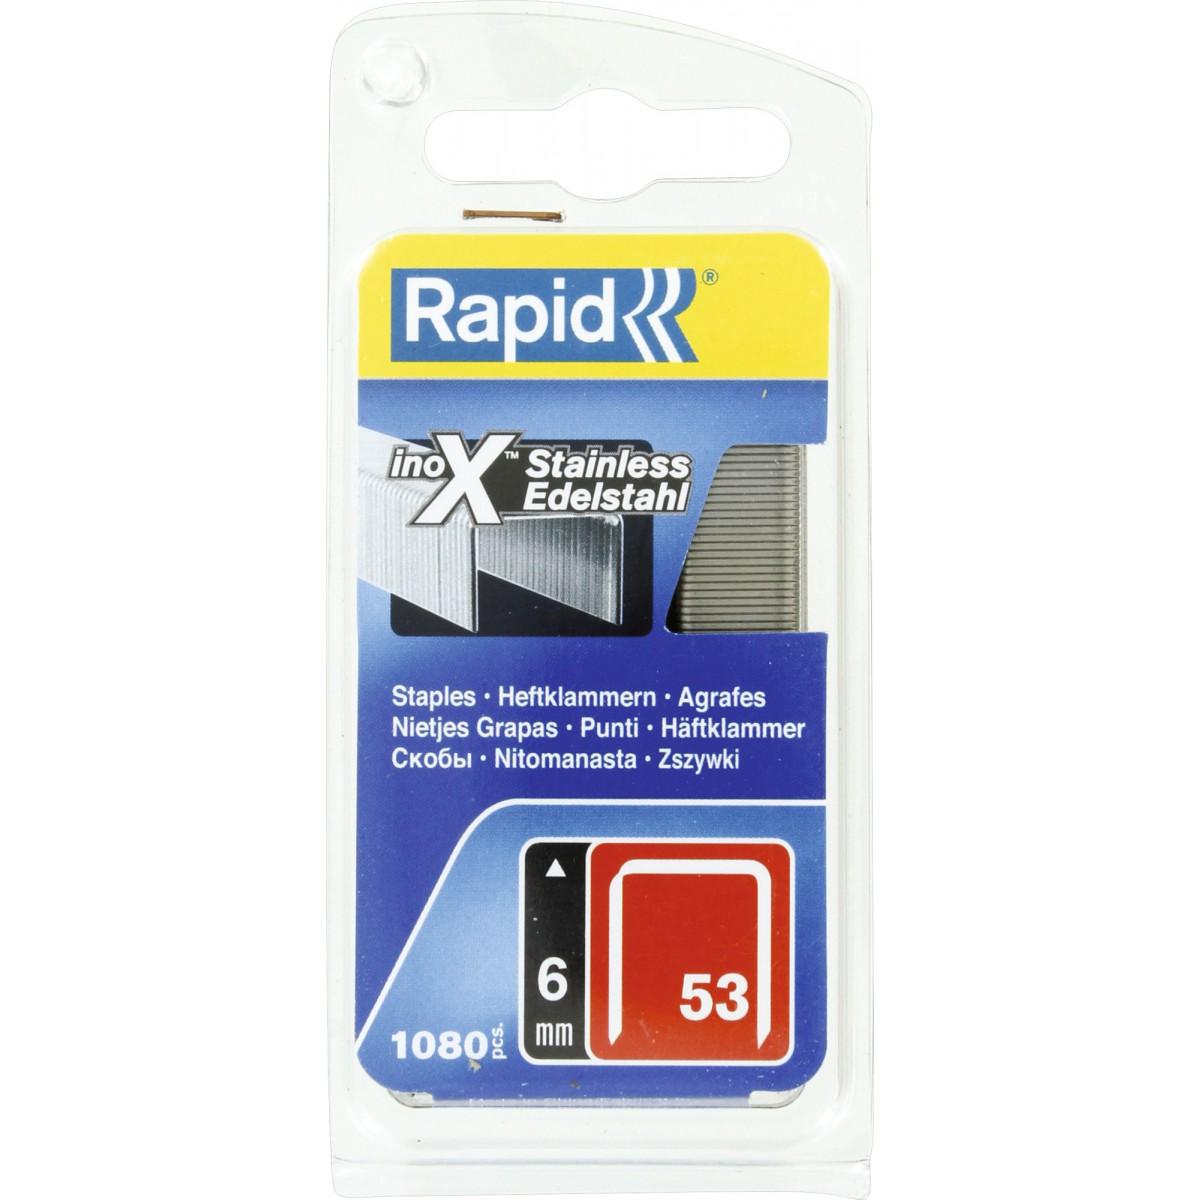 Agrafe inox n°53 Rapid Agraf - Hauteur 6 mm - 1080 agrafes